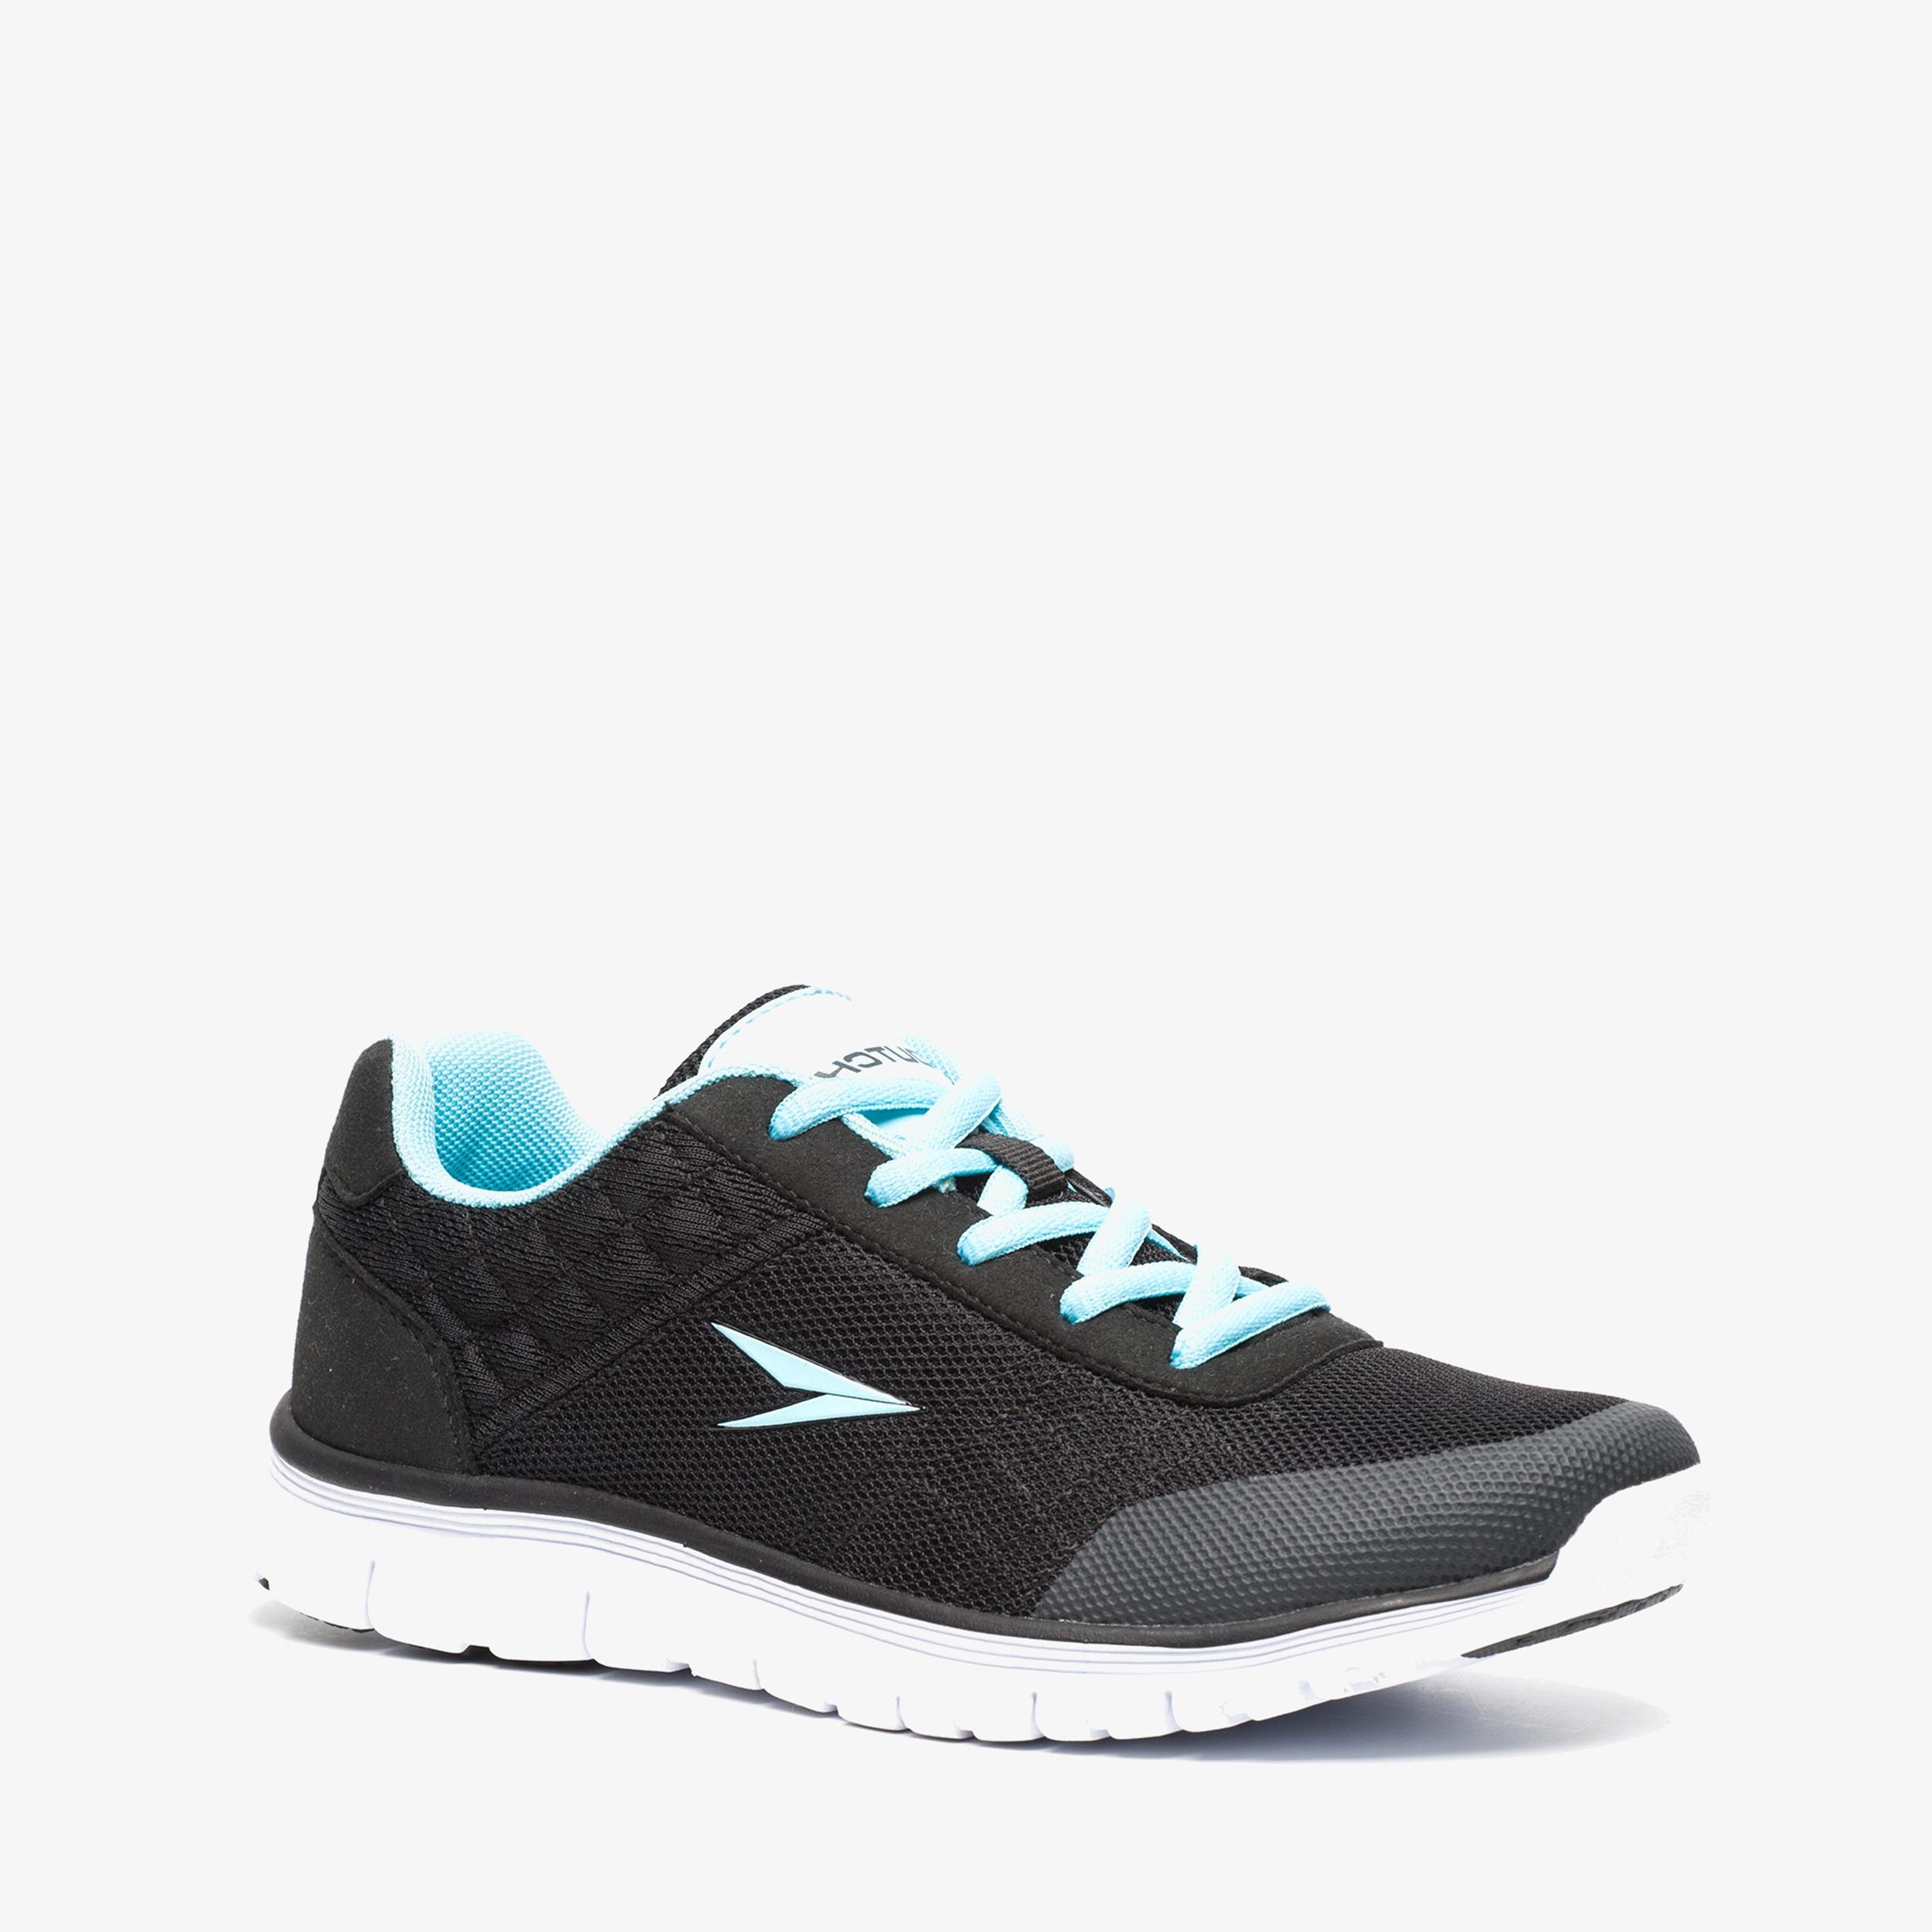 scapino nike running schoenen vrouwen